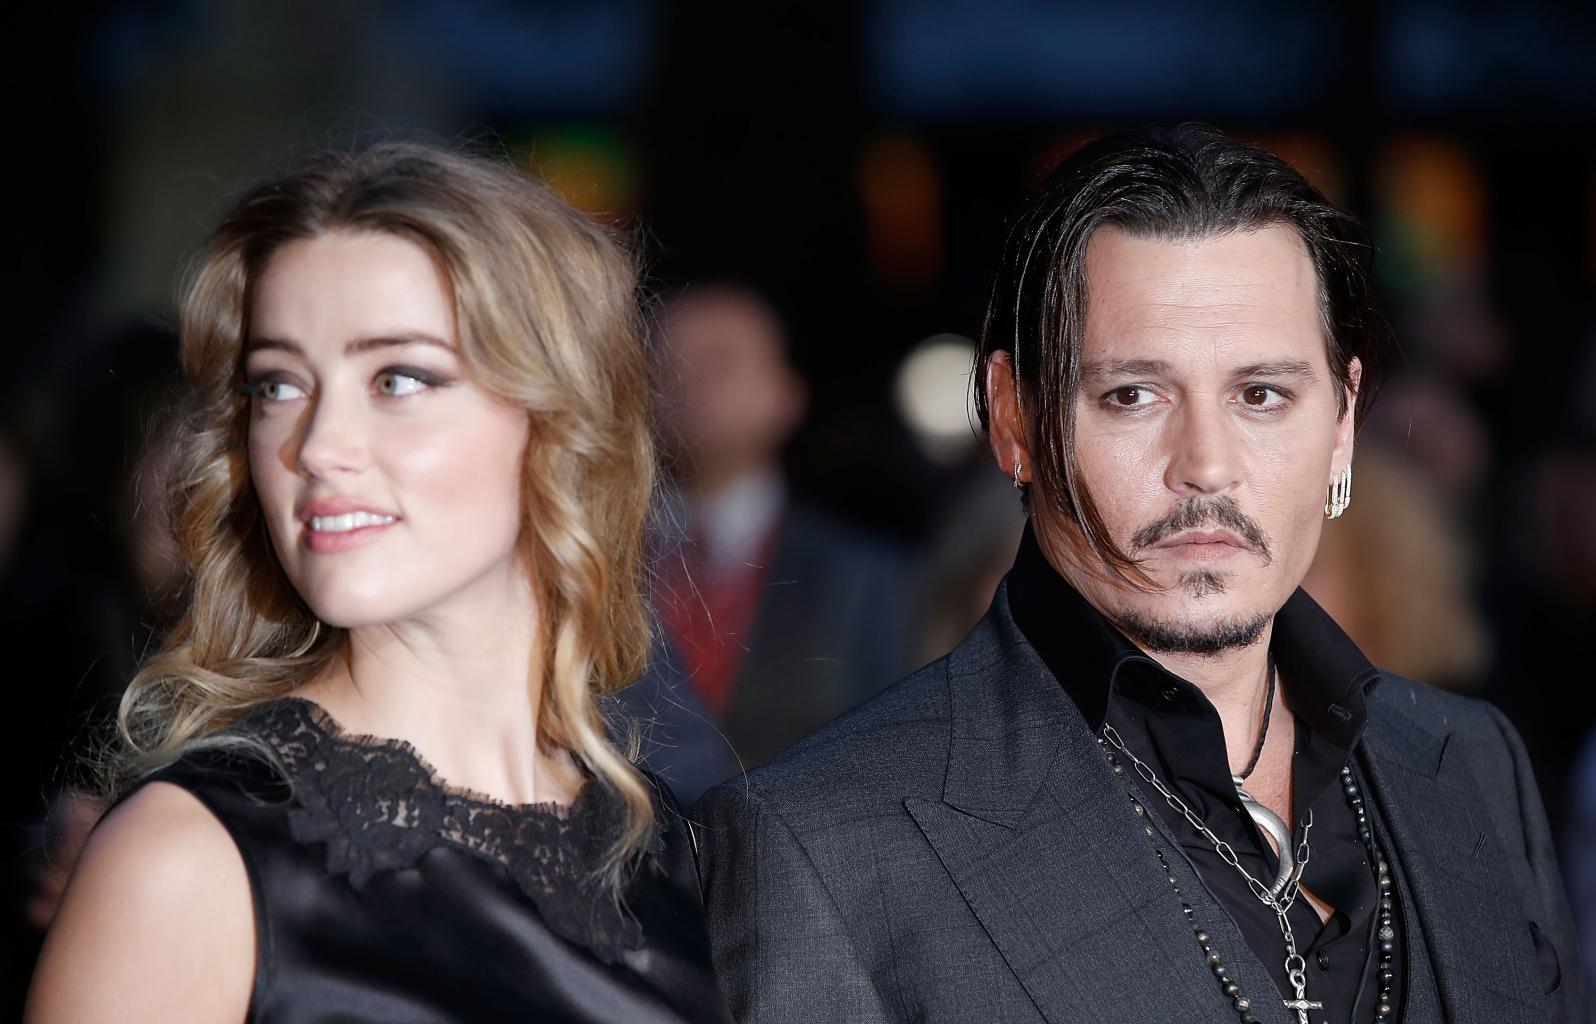 Aggressive Johnny Depp Smashes Kitchen, Filmed By Amber Heard